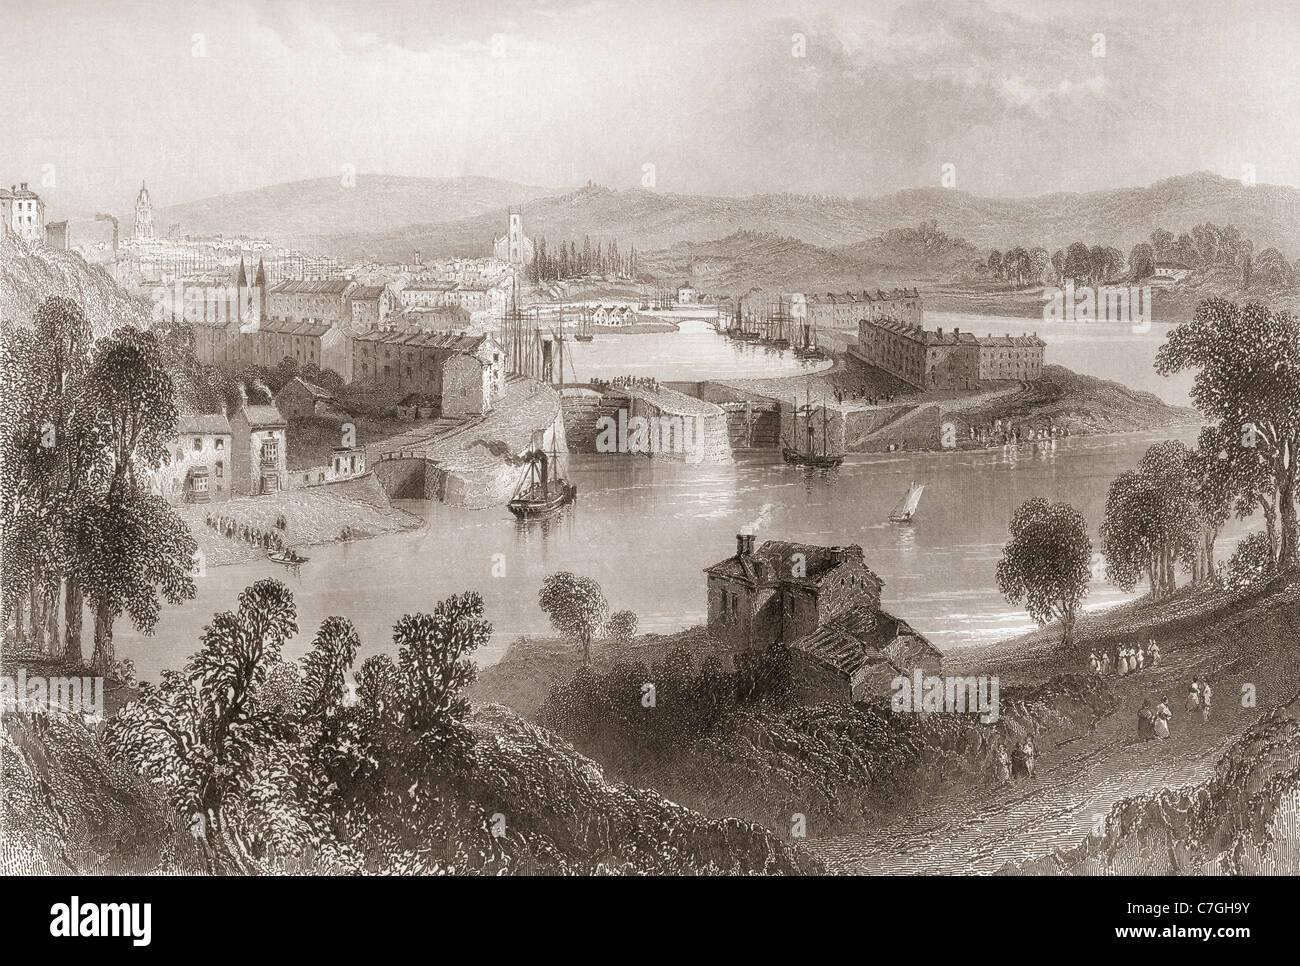 Bristol, Angleterre au début du xixe siècle. Photo Stock